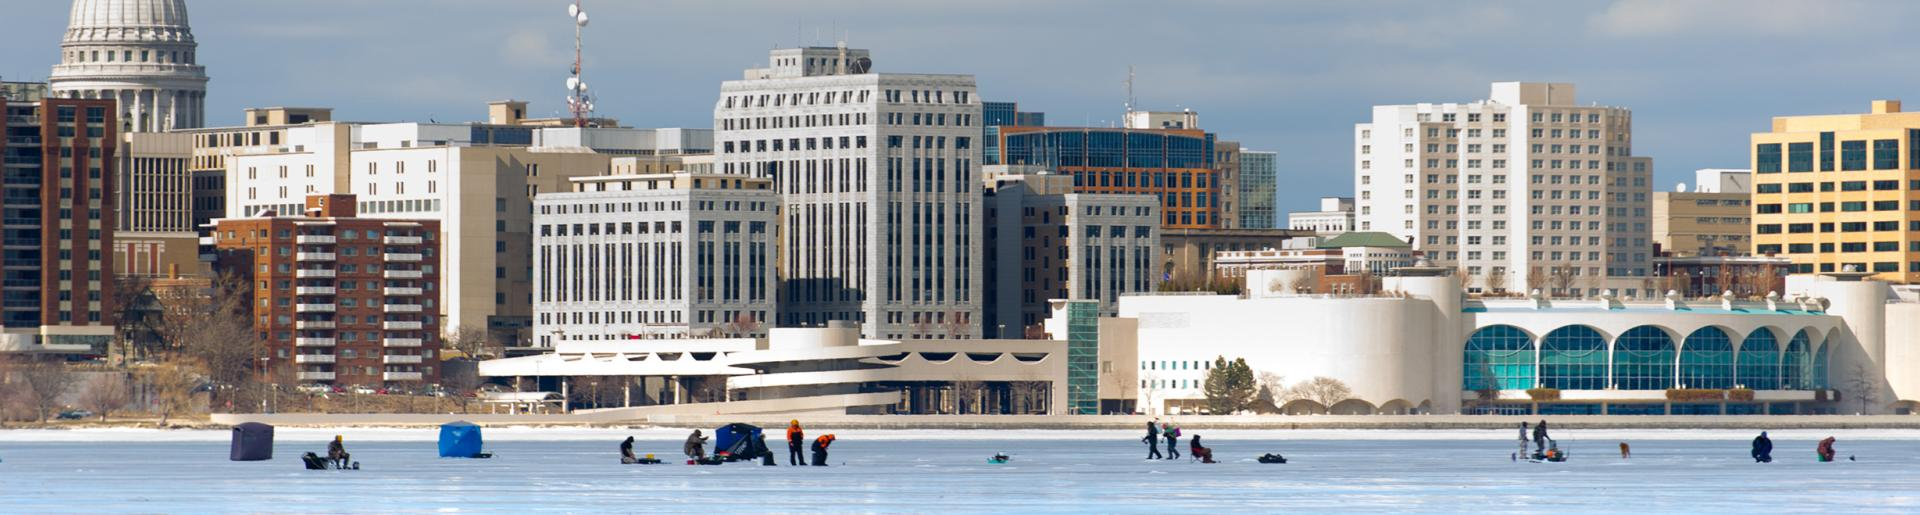 Madison Skyline in Winter